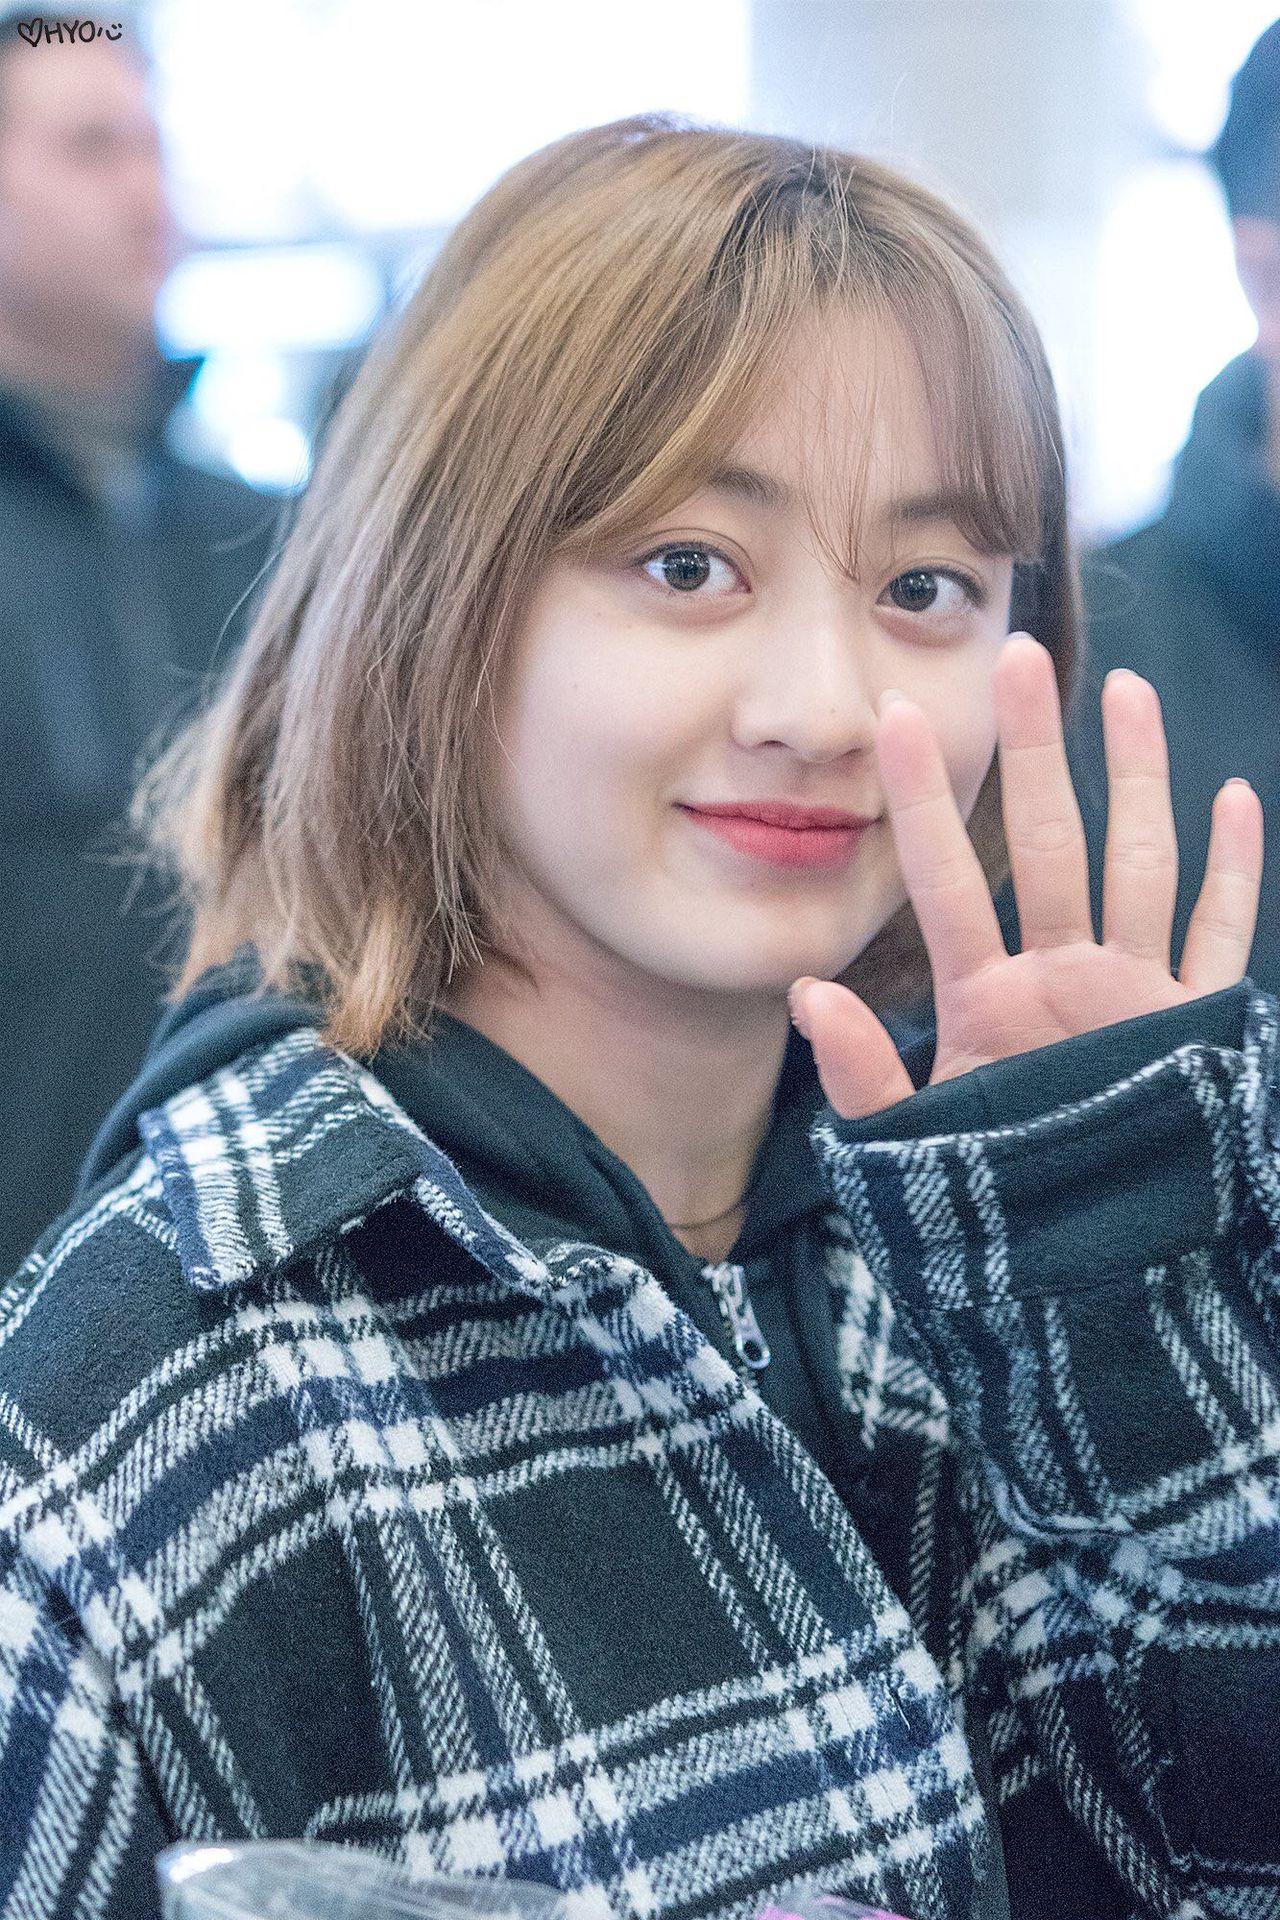 Twice Oneshots - (TWICE X FEMALE READER) - Jihyo-